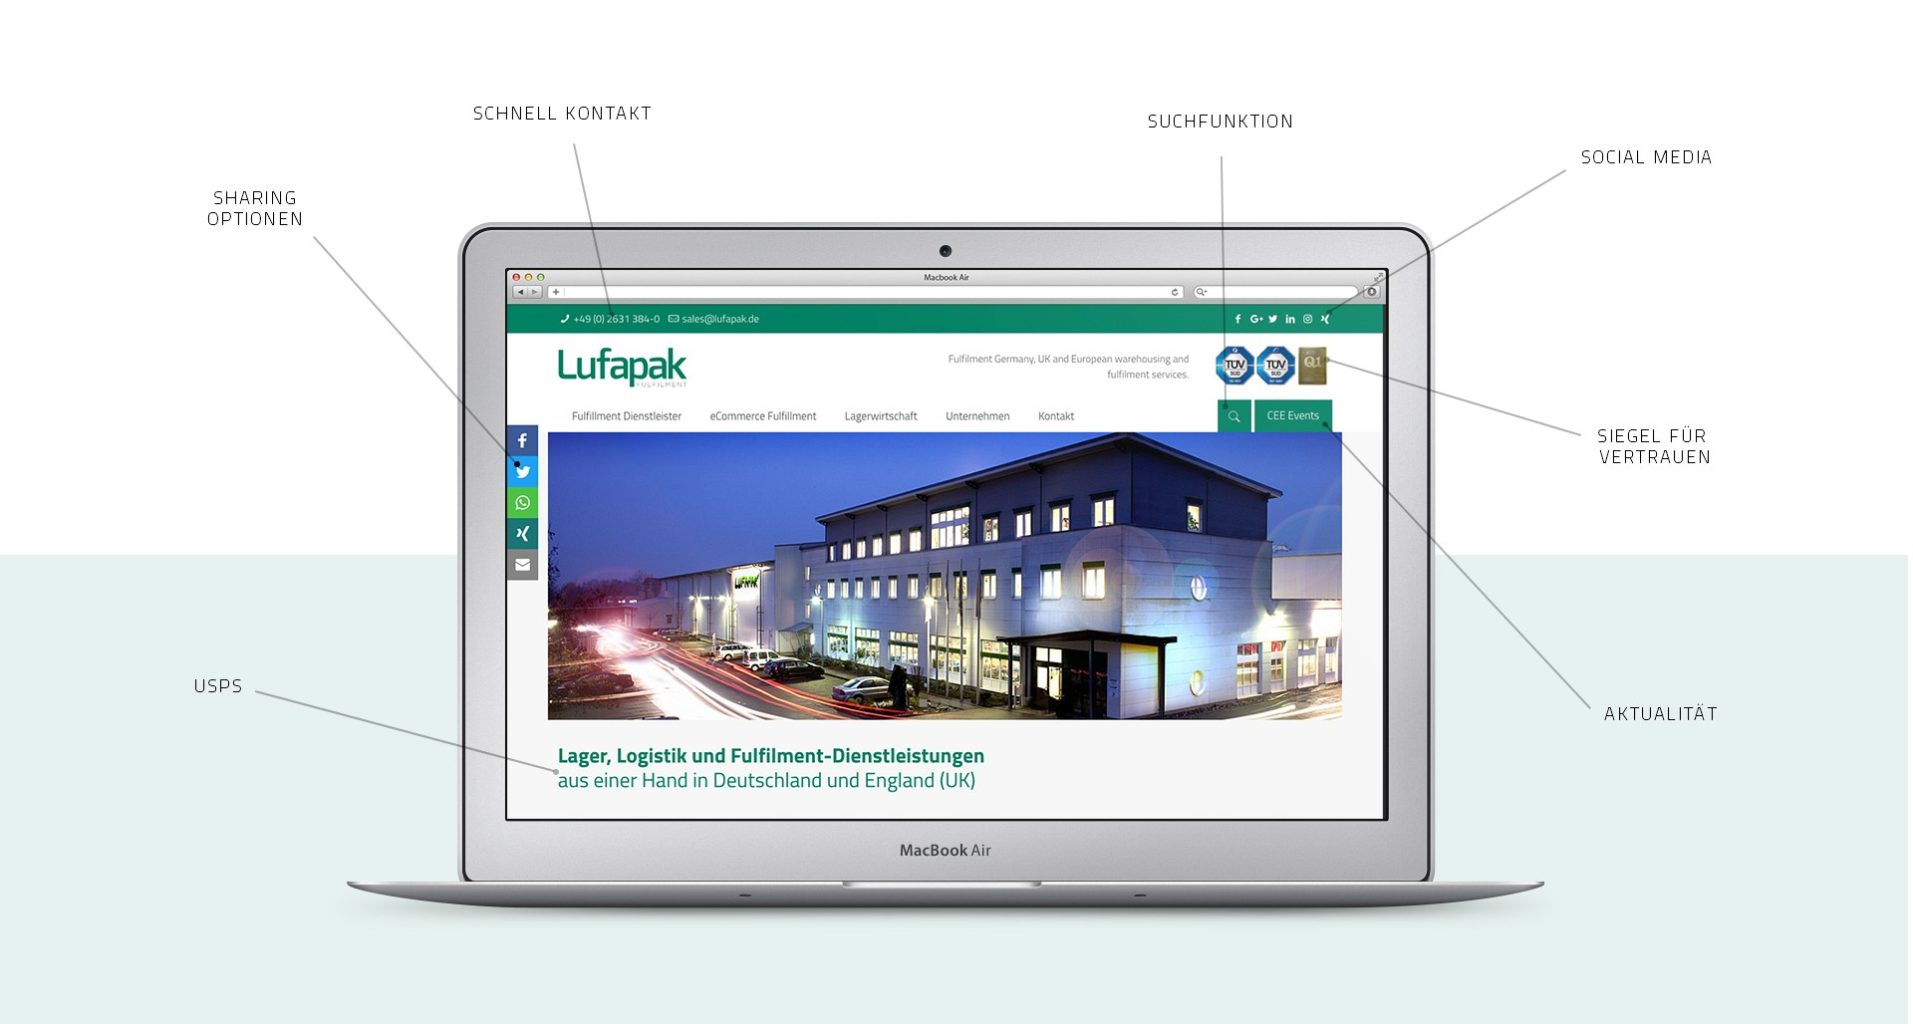 Lufapak-fullfillment-dienstleister-referenz-pictibe-4